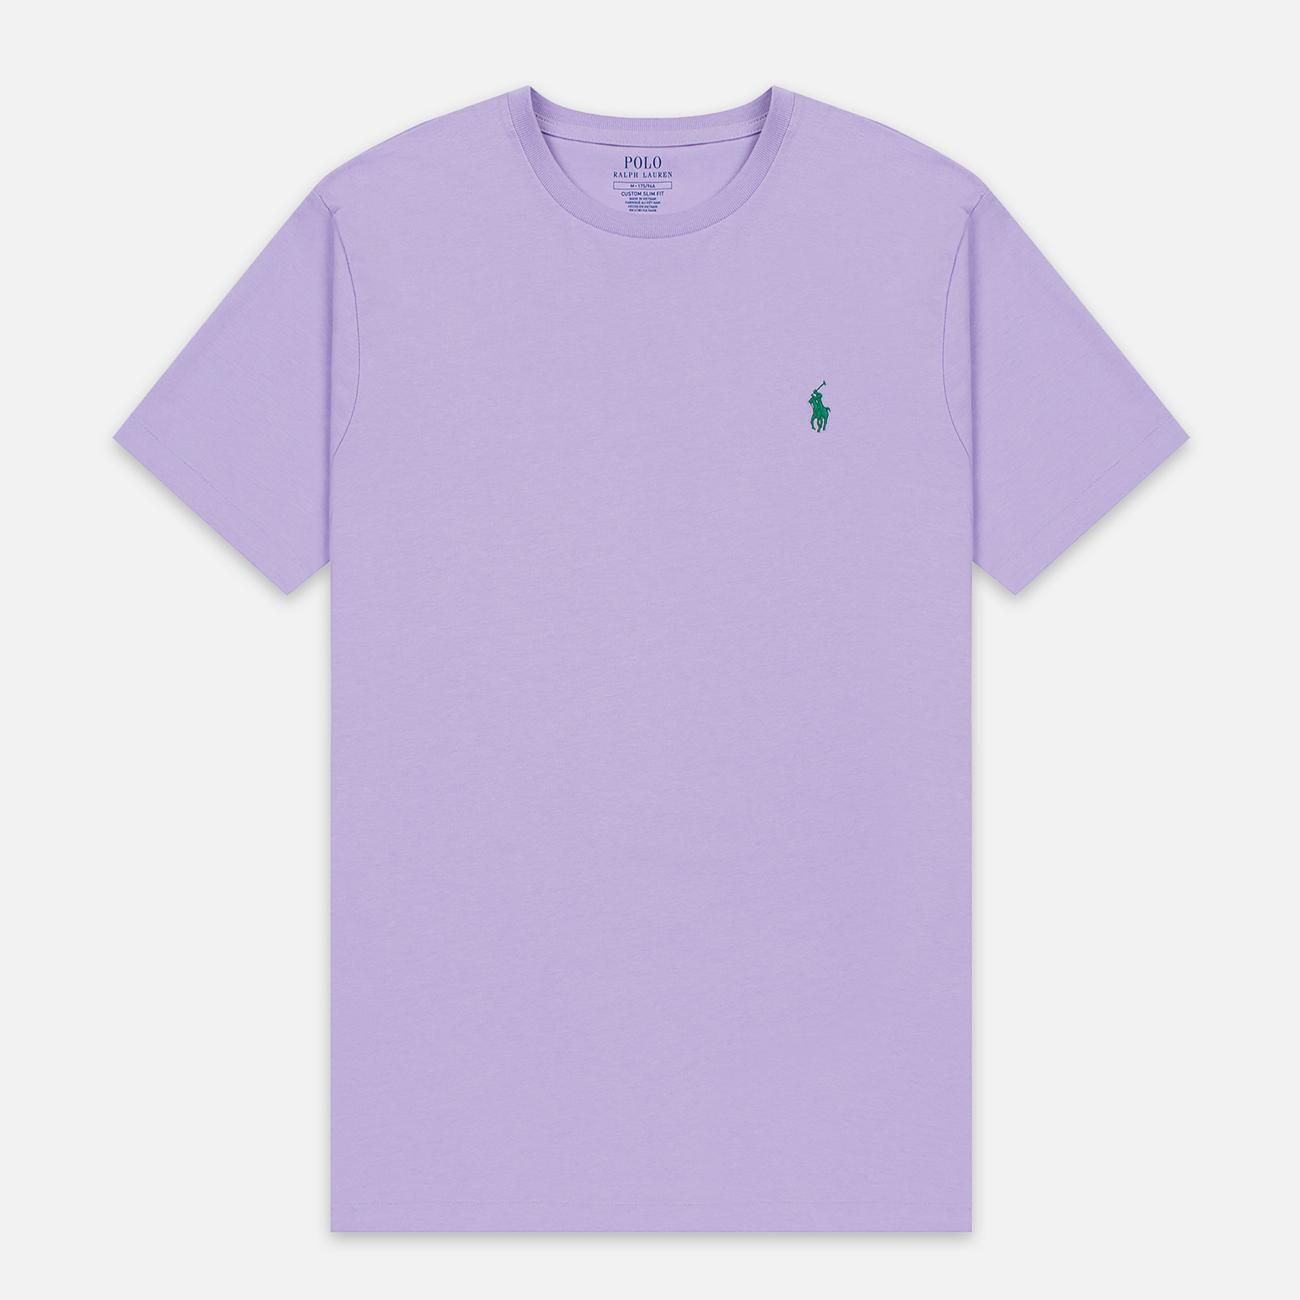 Мужская футболка Polo Ralph Lauren Classic Crew Neck 26/1 Jersey English Lavender